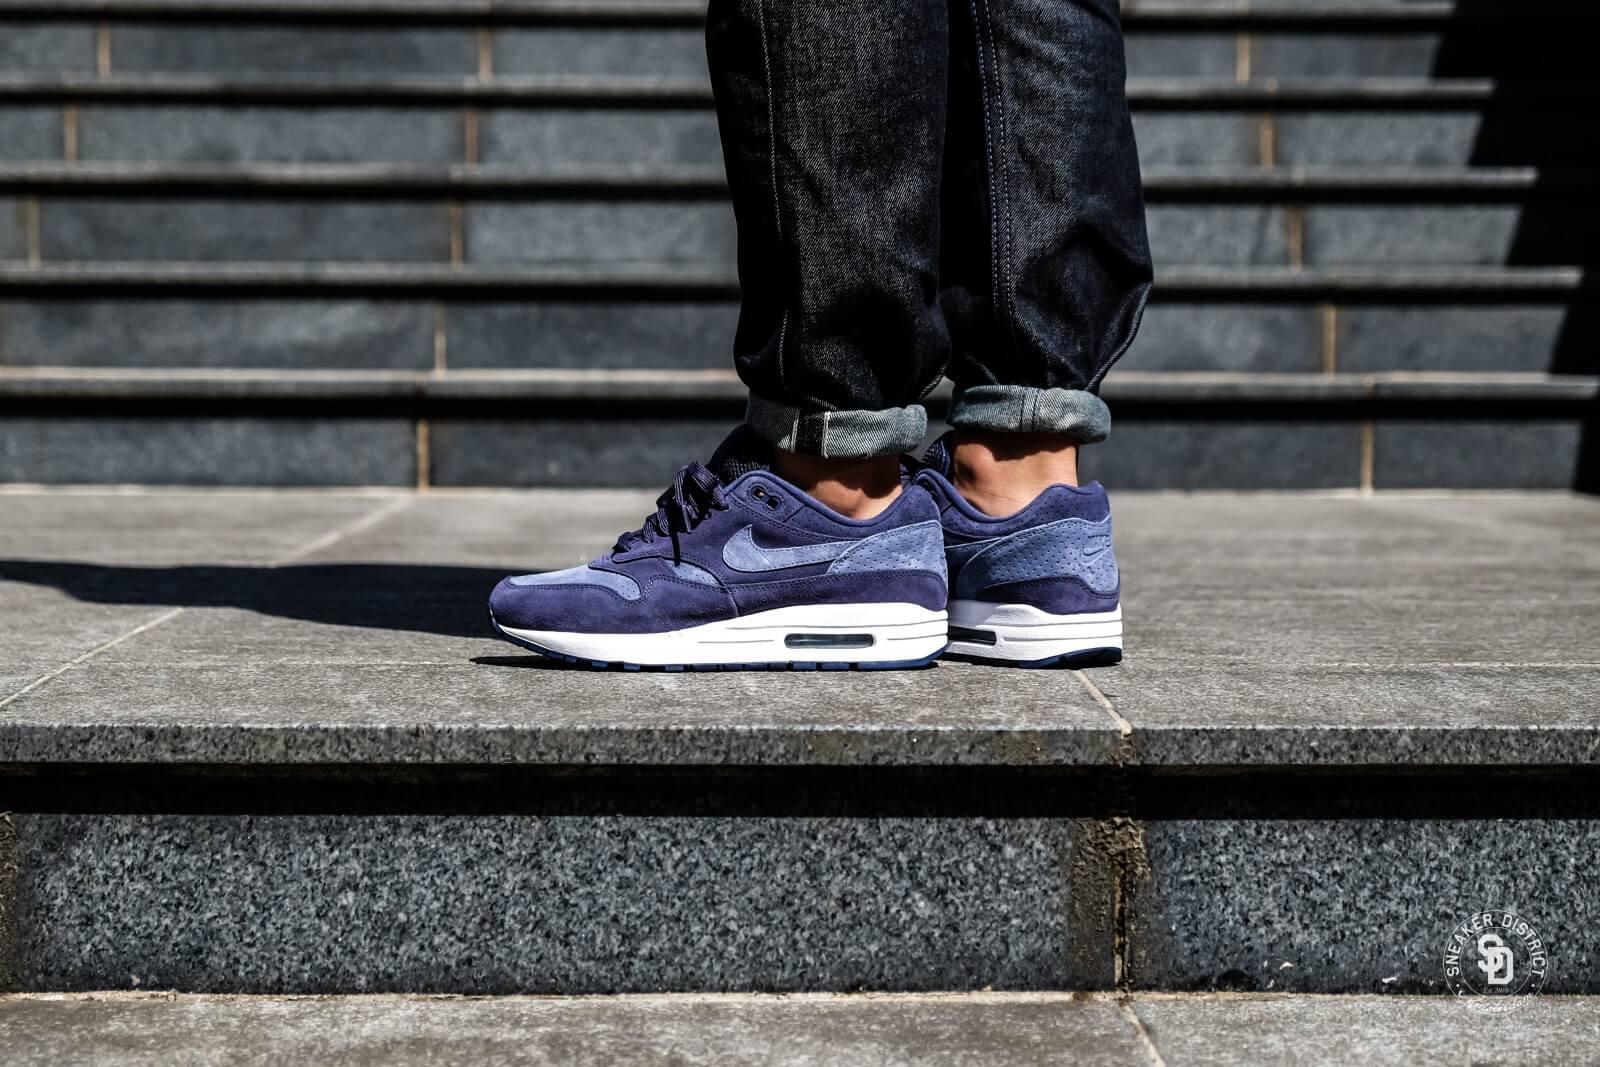 Nike Air Max 1 Premium Neutral IndigoDiffused Blue 875844 501